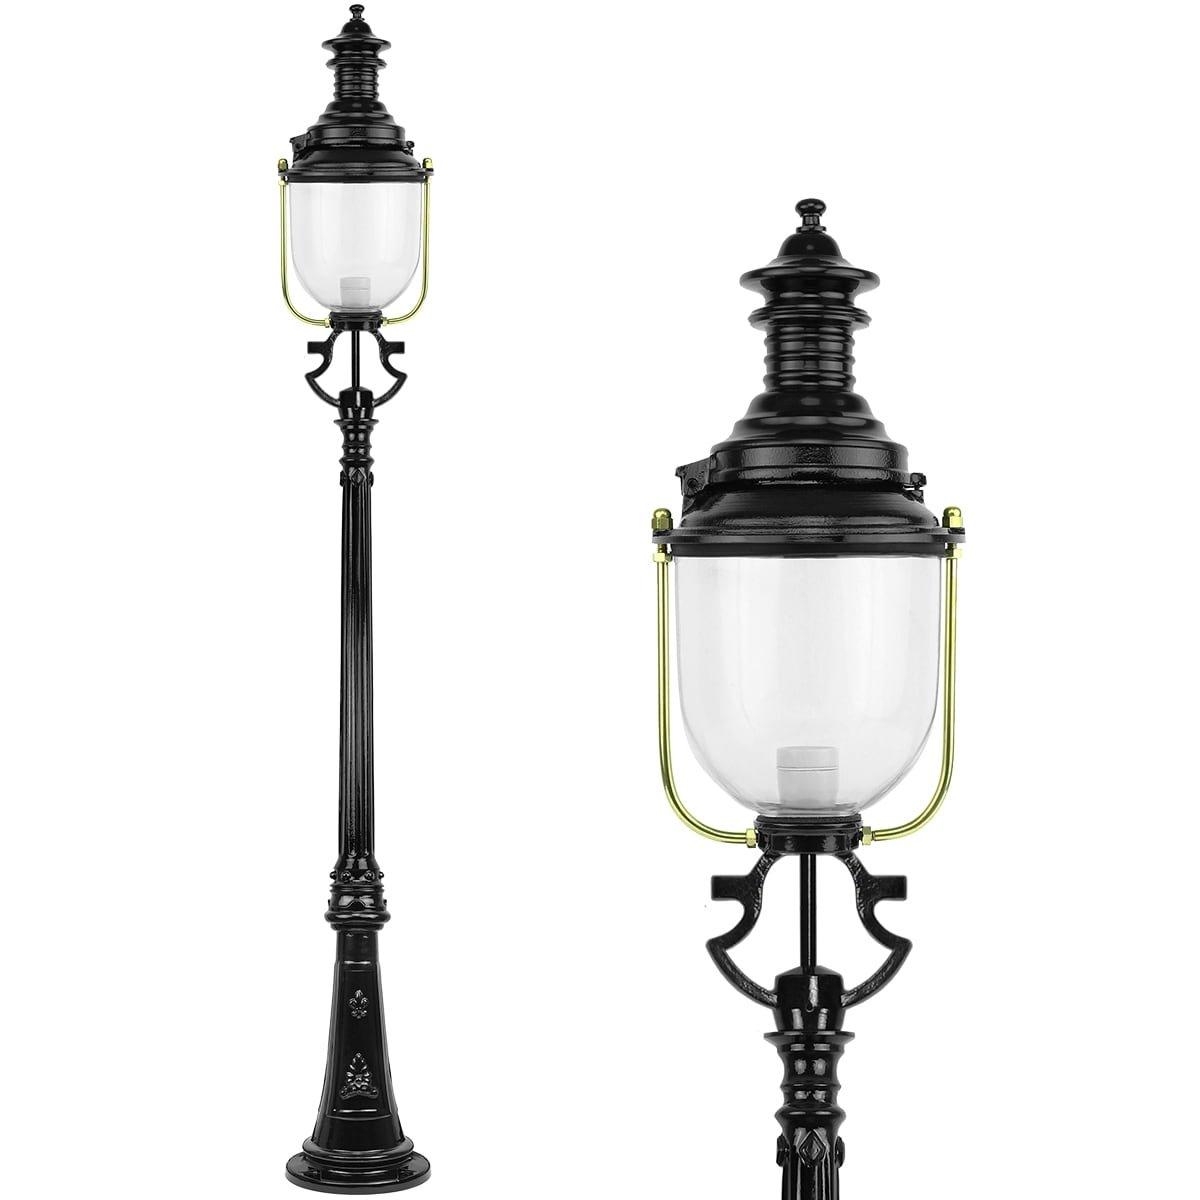 Outdoor Lighting Classic Rural Outdoor lantern authentic Oosthem - 255 cm